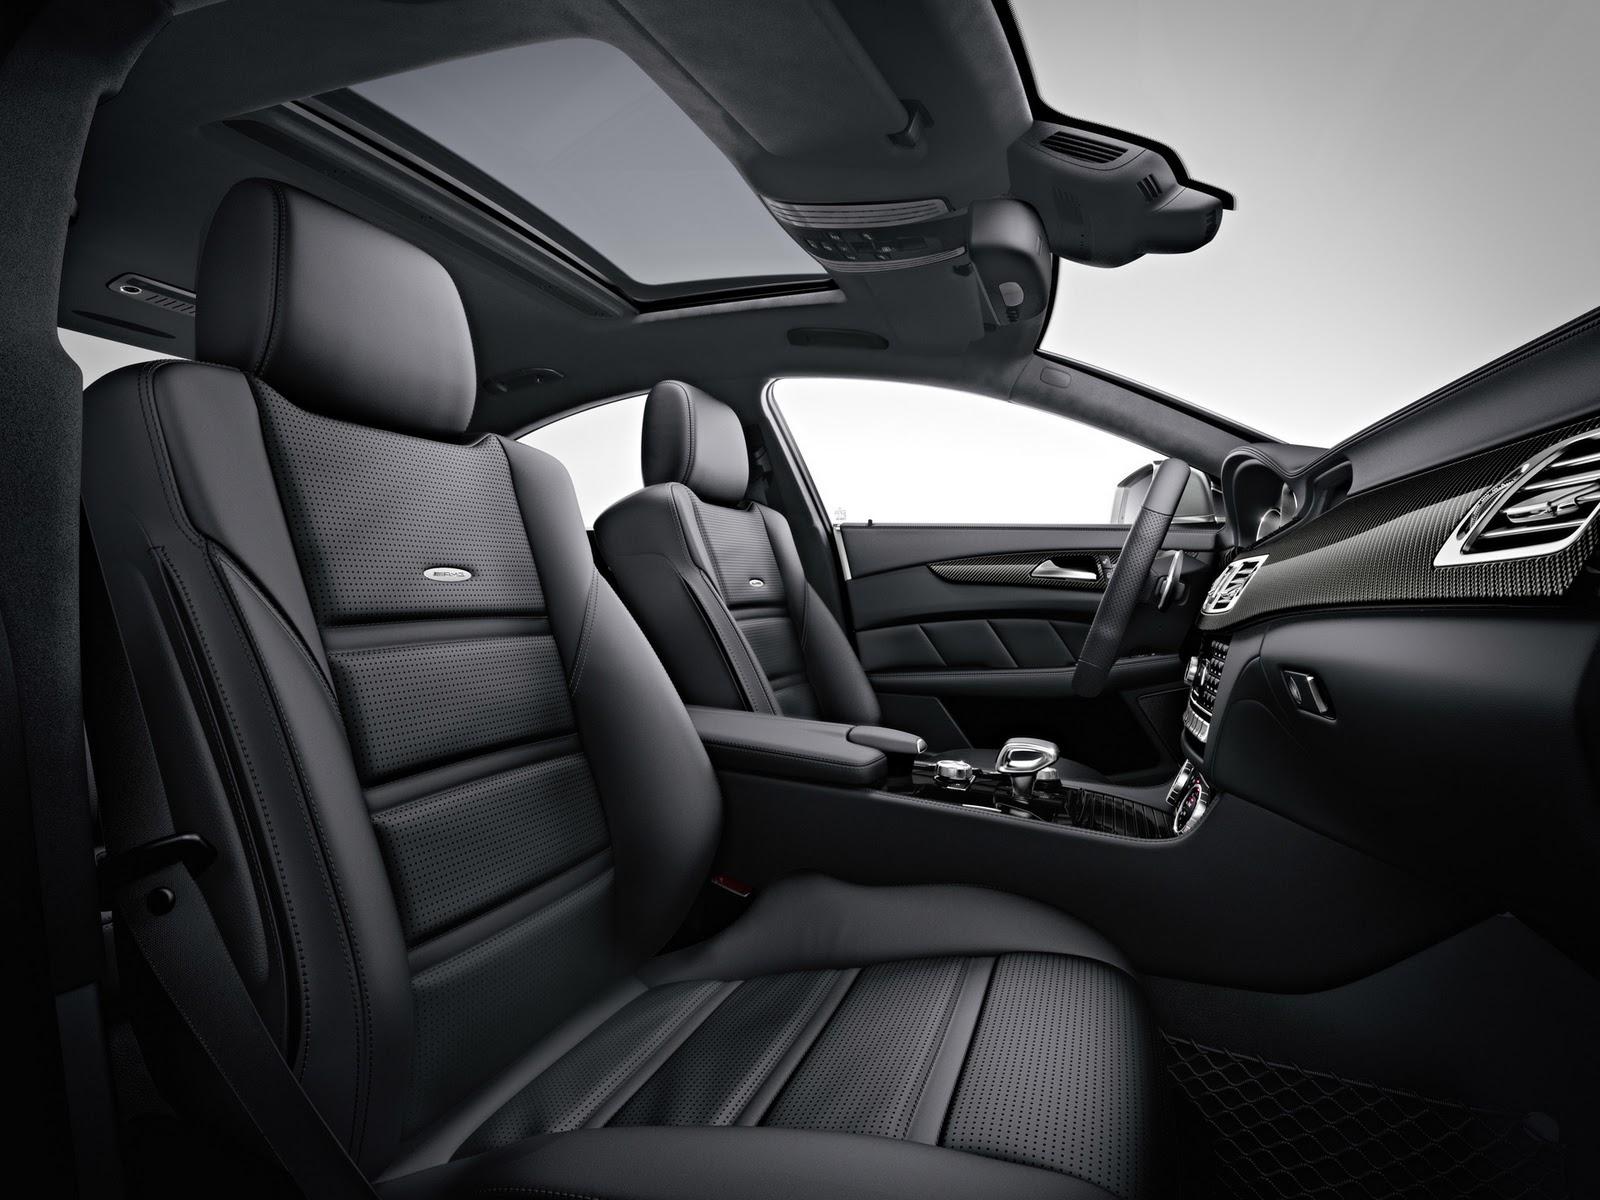 http://3.bp.blogspot.com/_viCh1SFyGrA/TO1u9HRuq5I/AAAAAAAAAJg/CbZY9sX5uzg/s1600/2011-Mercedes-Benz-CLS-63-AMG-Interior-1920x1440.jpg